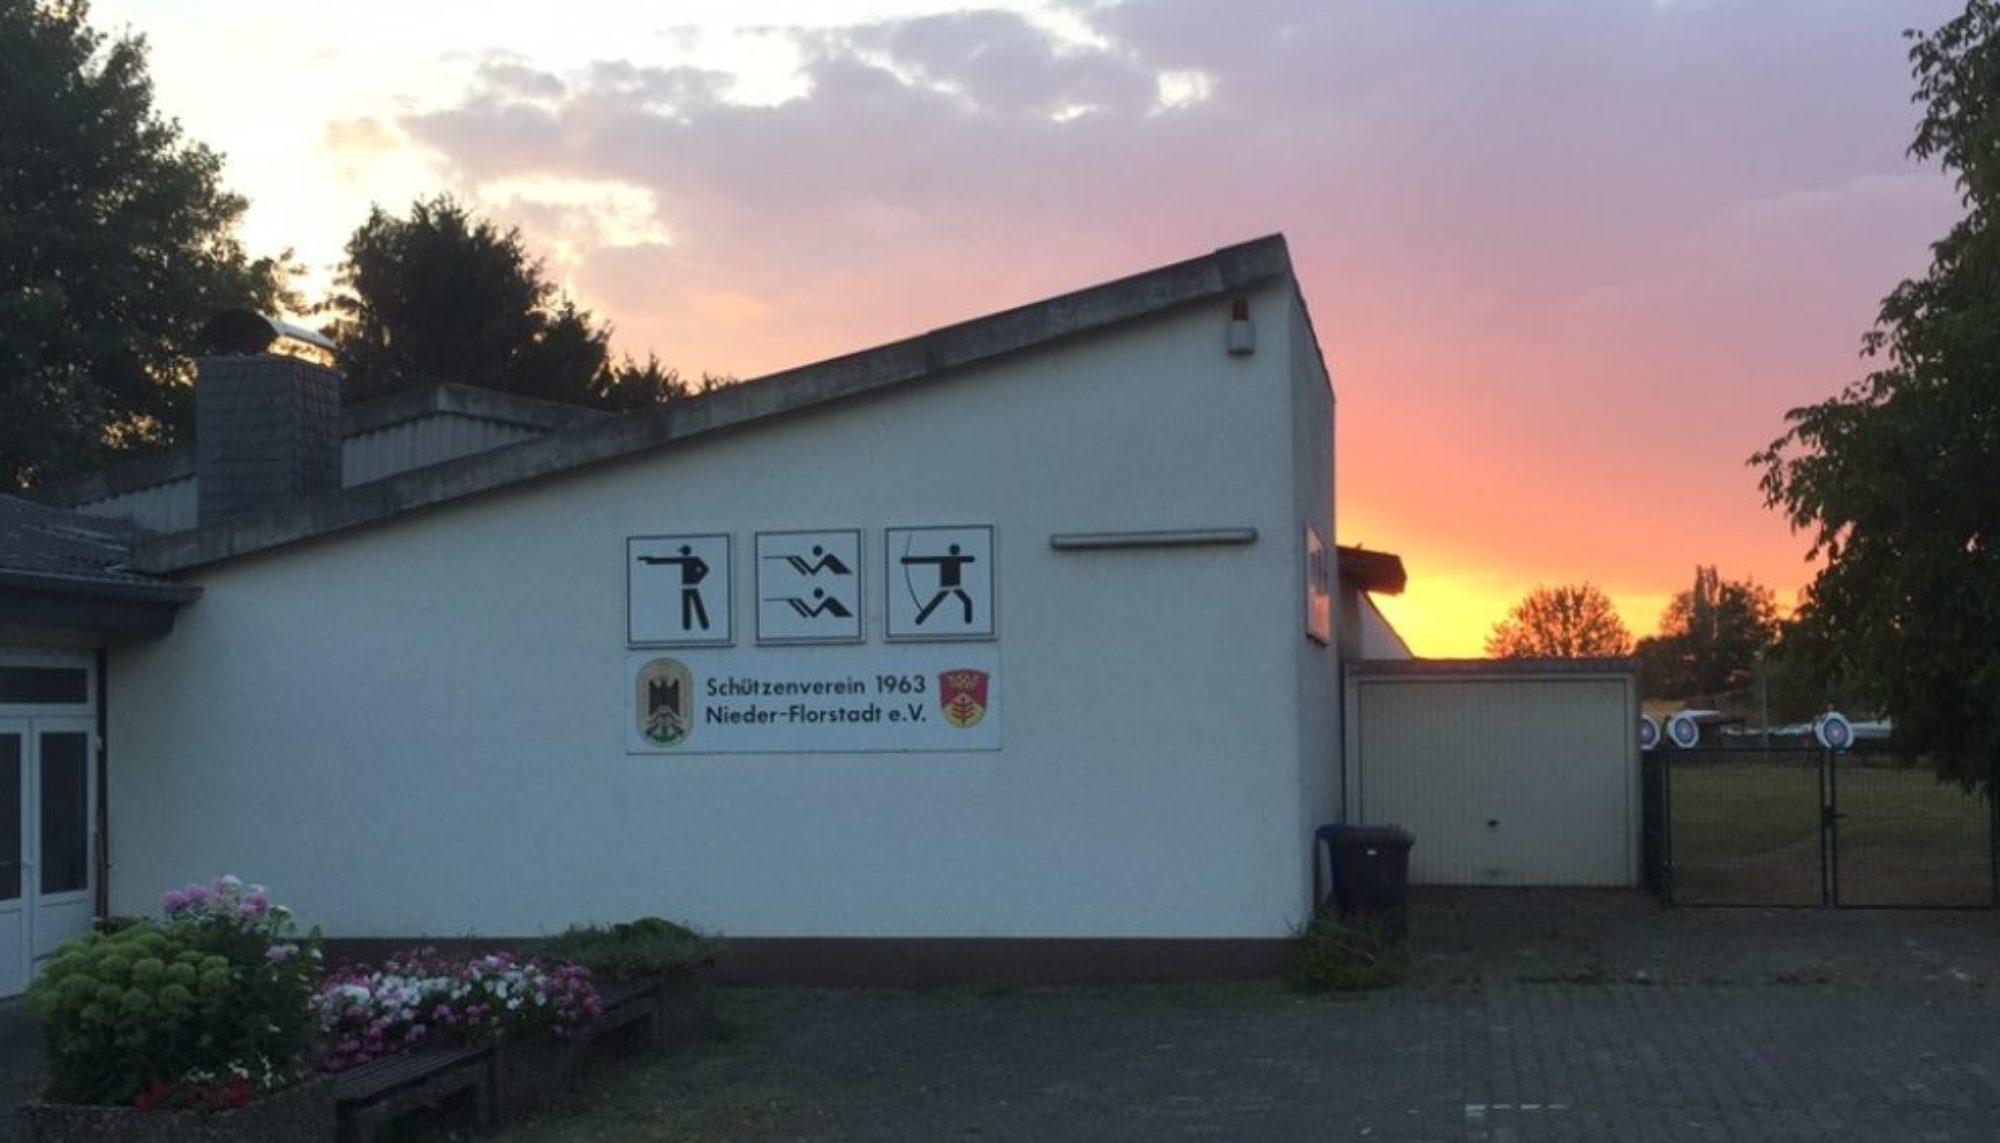 Schützenverein 1963 Nieder-Florstadt e.V.